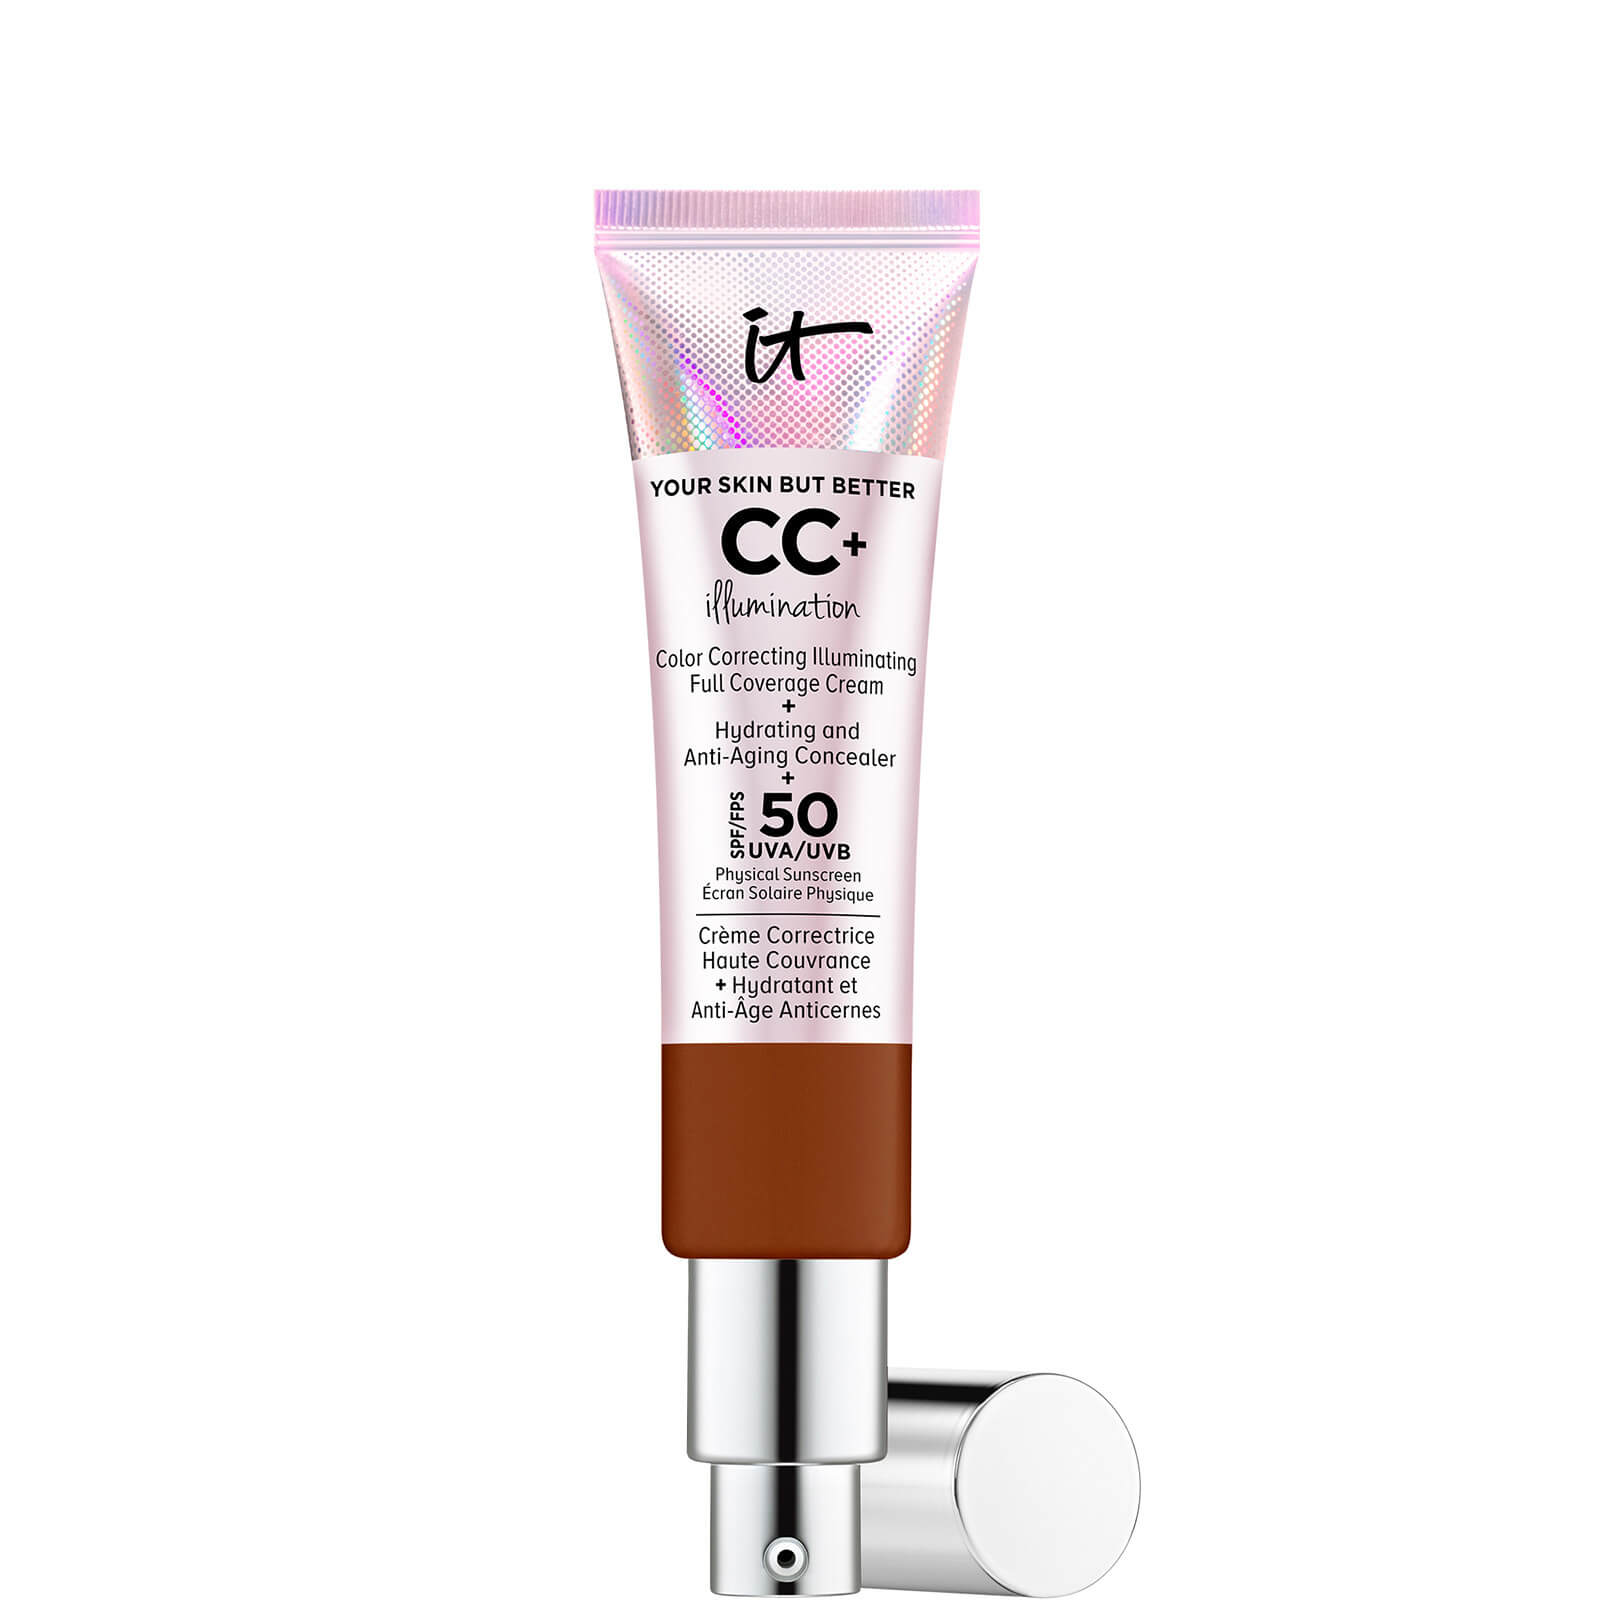 Купить IT Cosmetics Your Skin But Better CC+ Illumination SPF50 32ml (Various Shades) - Deep